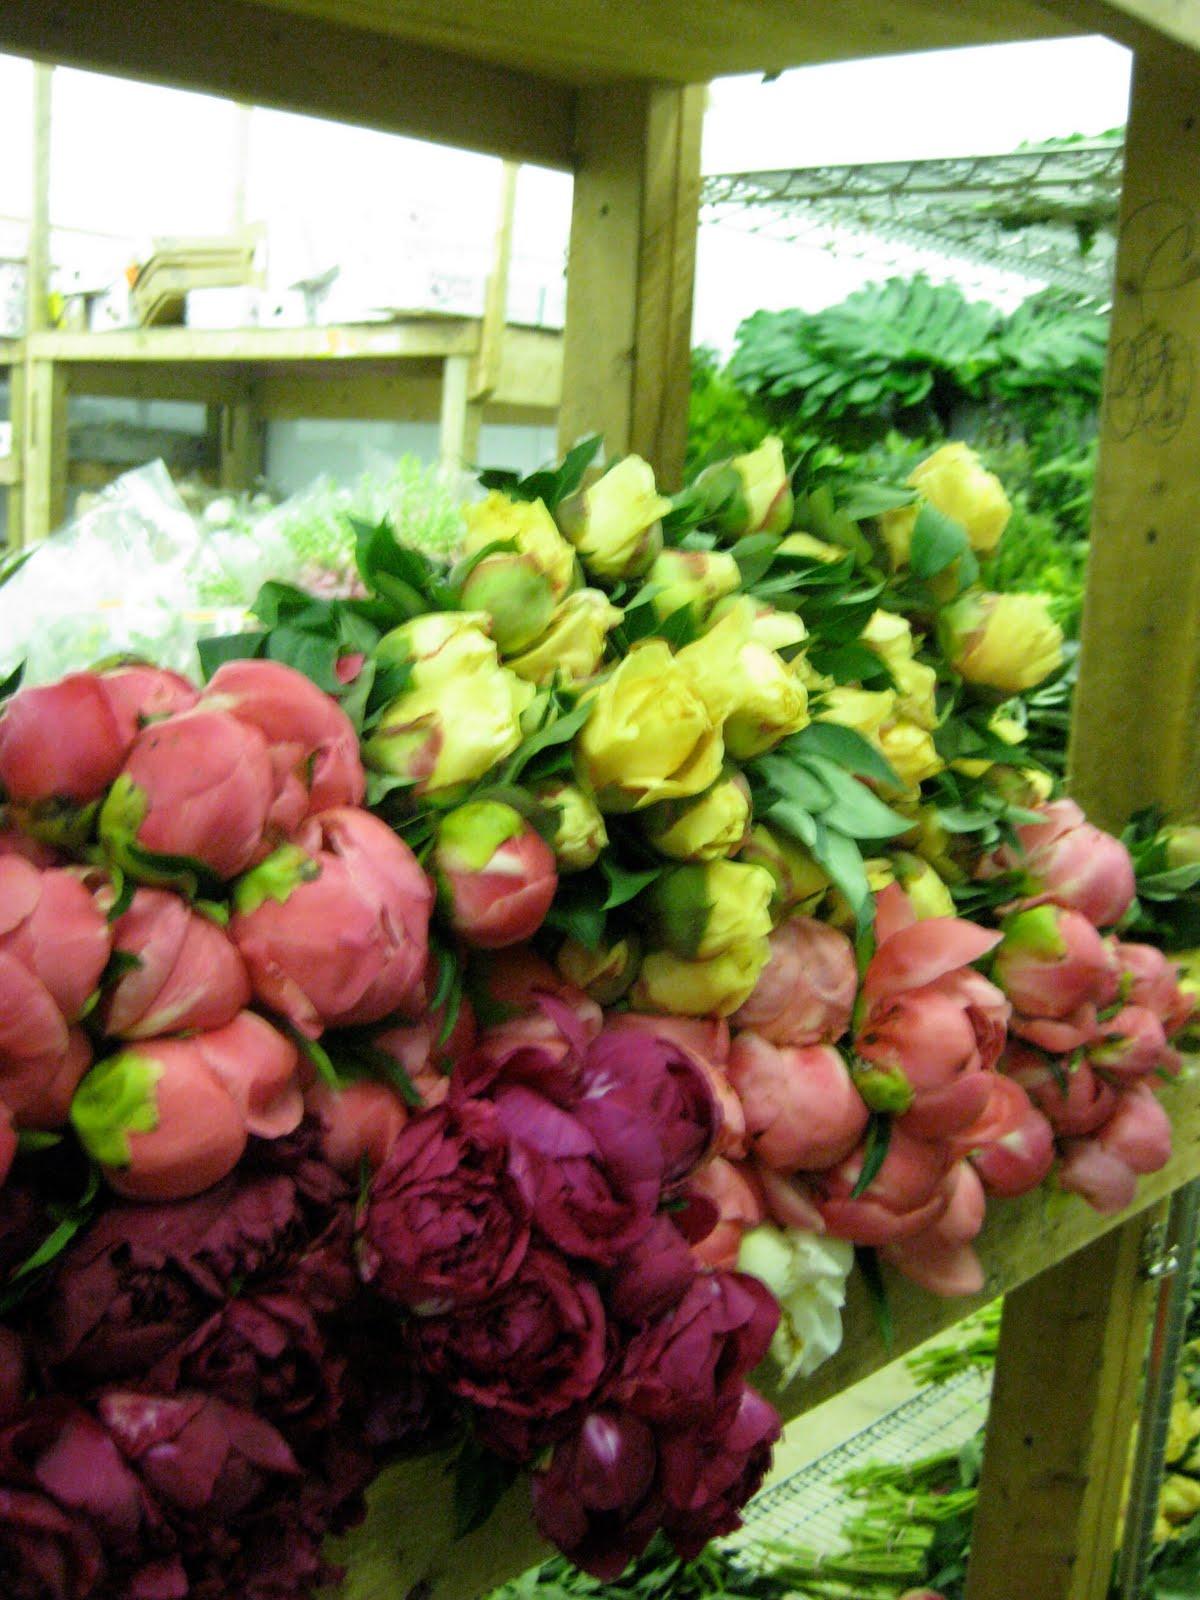 The Artisan Bride Good Morning Potomac Floral Mart